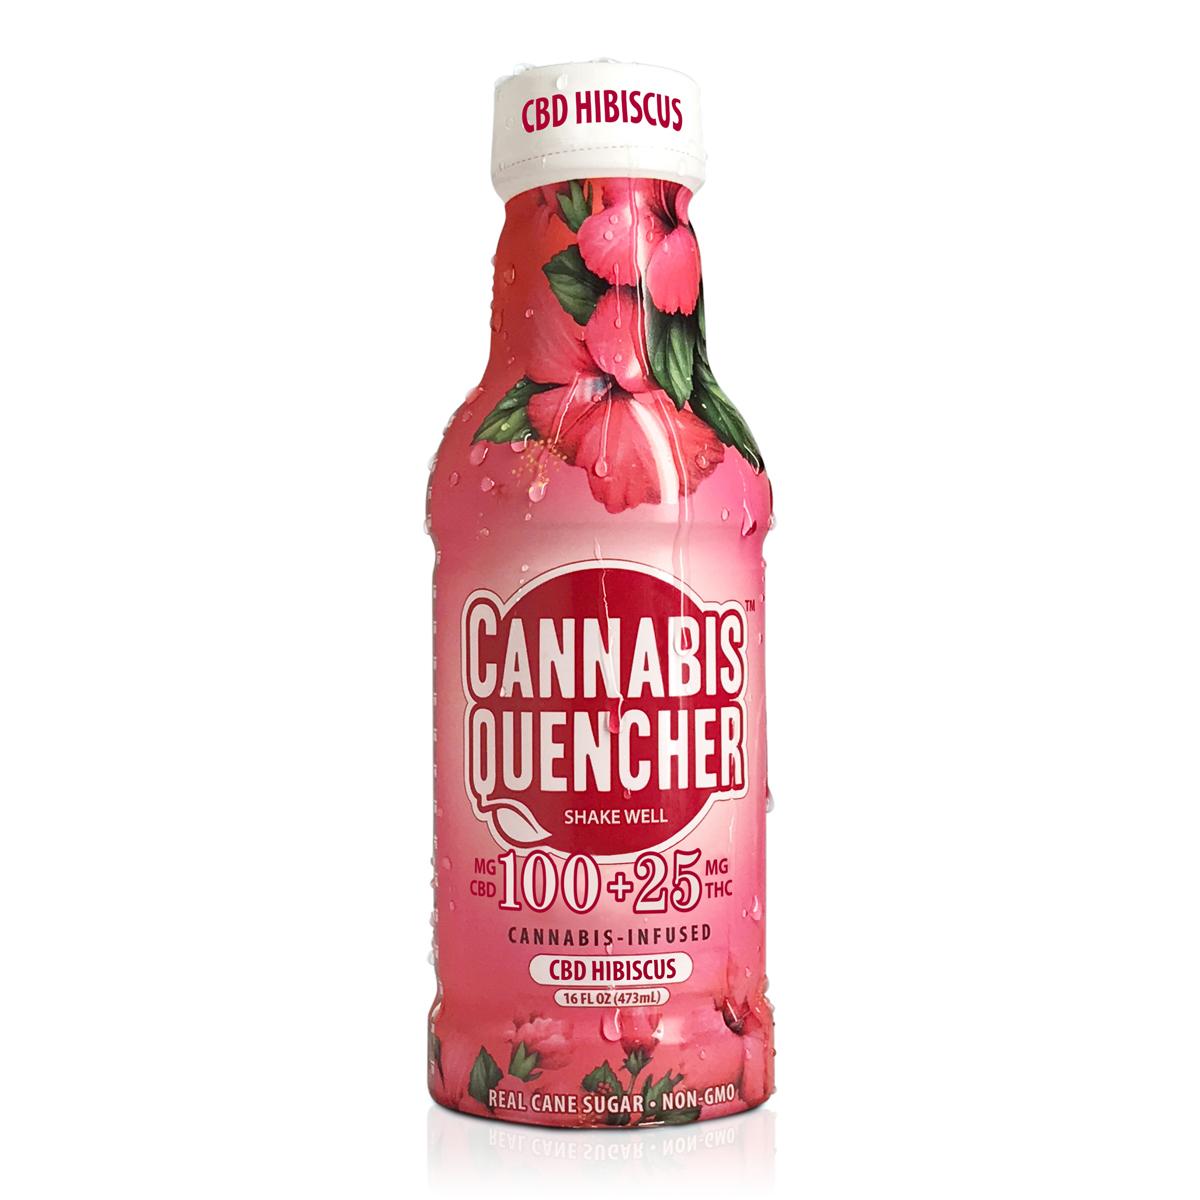 CBD Hibiscus Cannabis Quencher